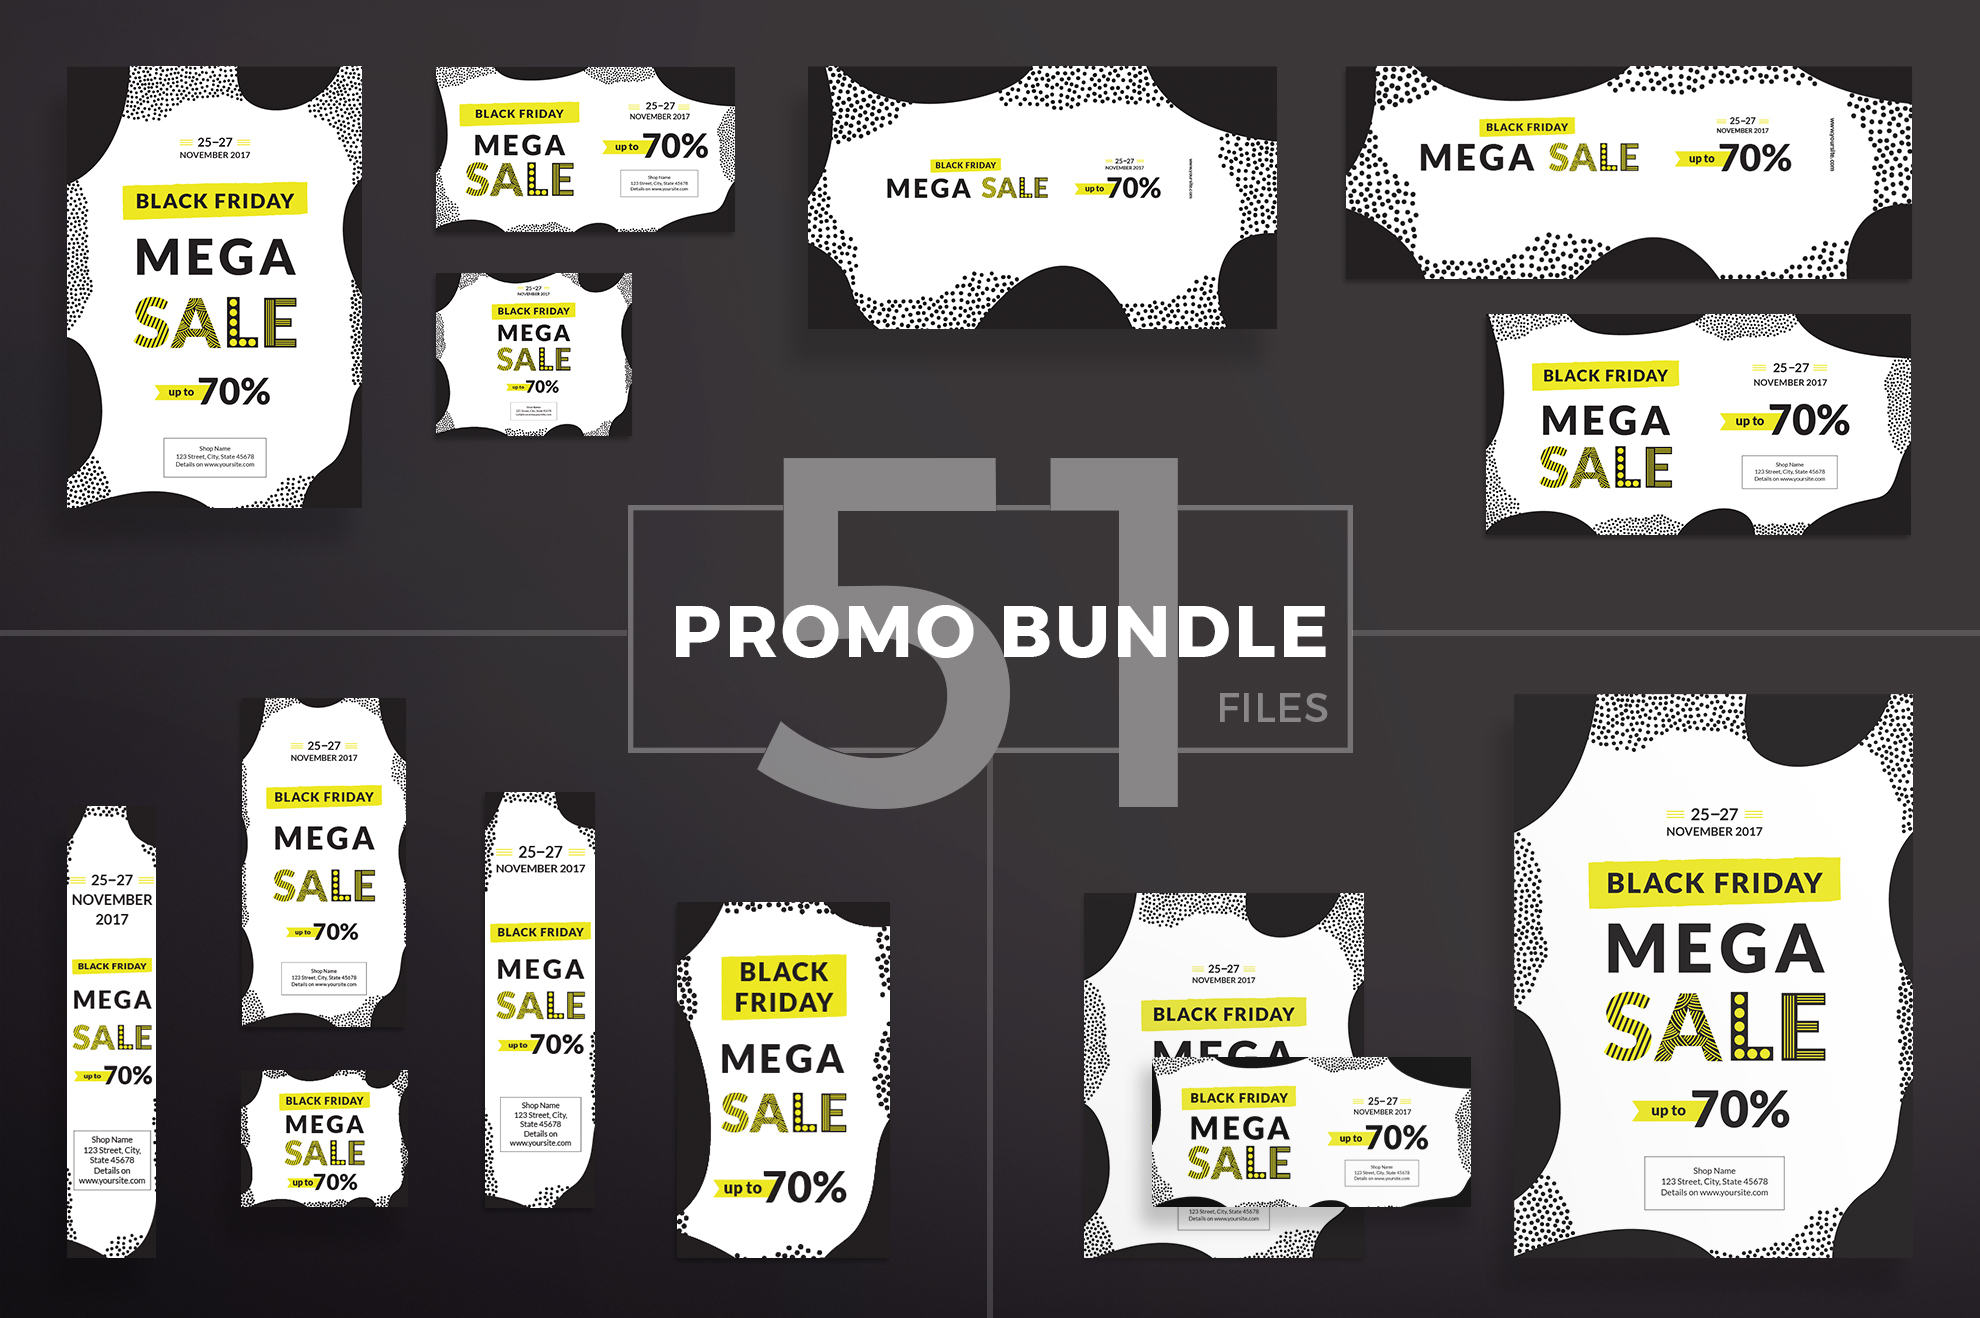 Black Friday Sale Design Templates Bundle example image 1